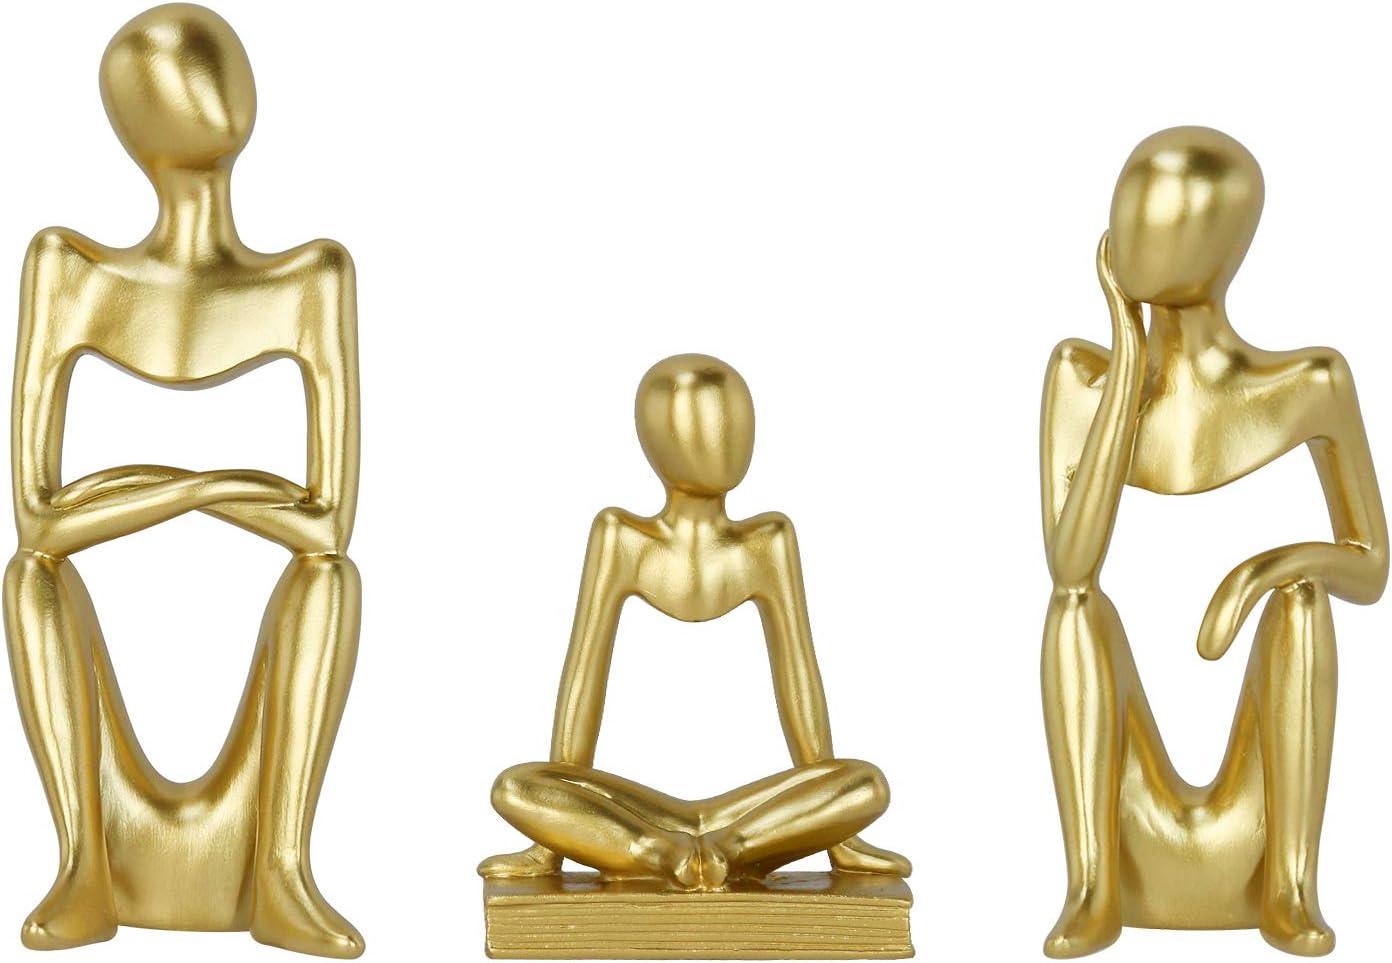 Creproly Resin Sculpture Art Small Sculpture Gold Abstract Statue Figurine Kit Home Office Desktop Bookshelf Decor 3Pcs (Family)